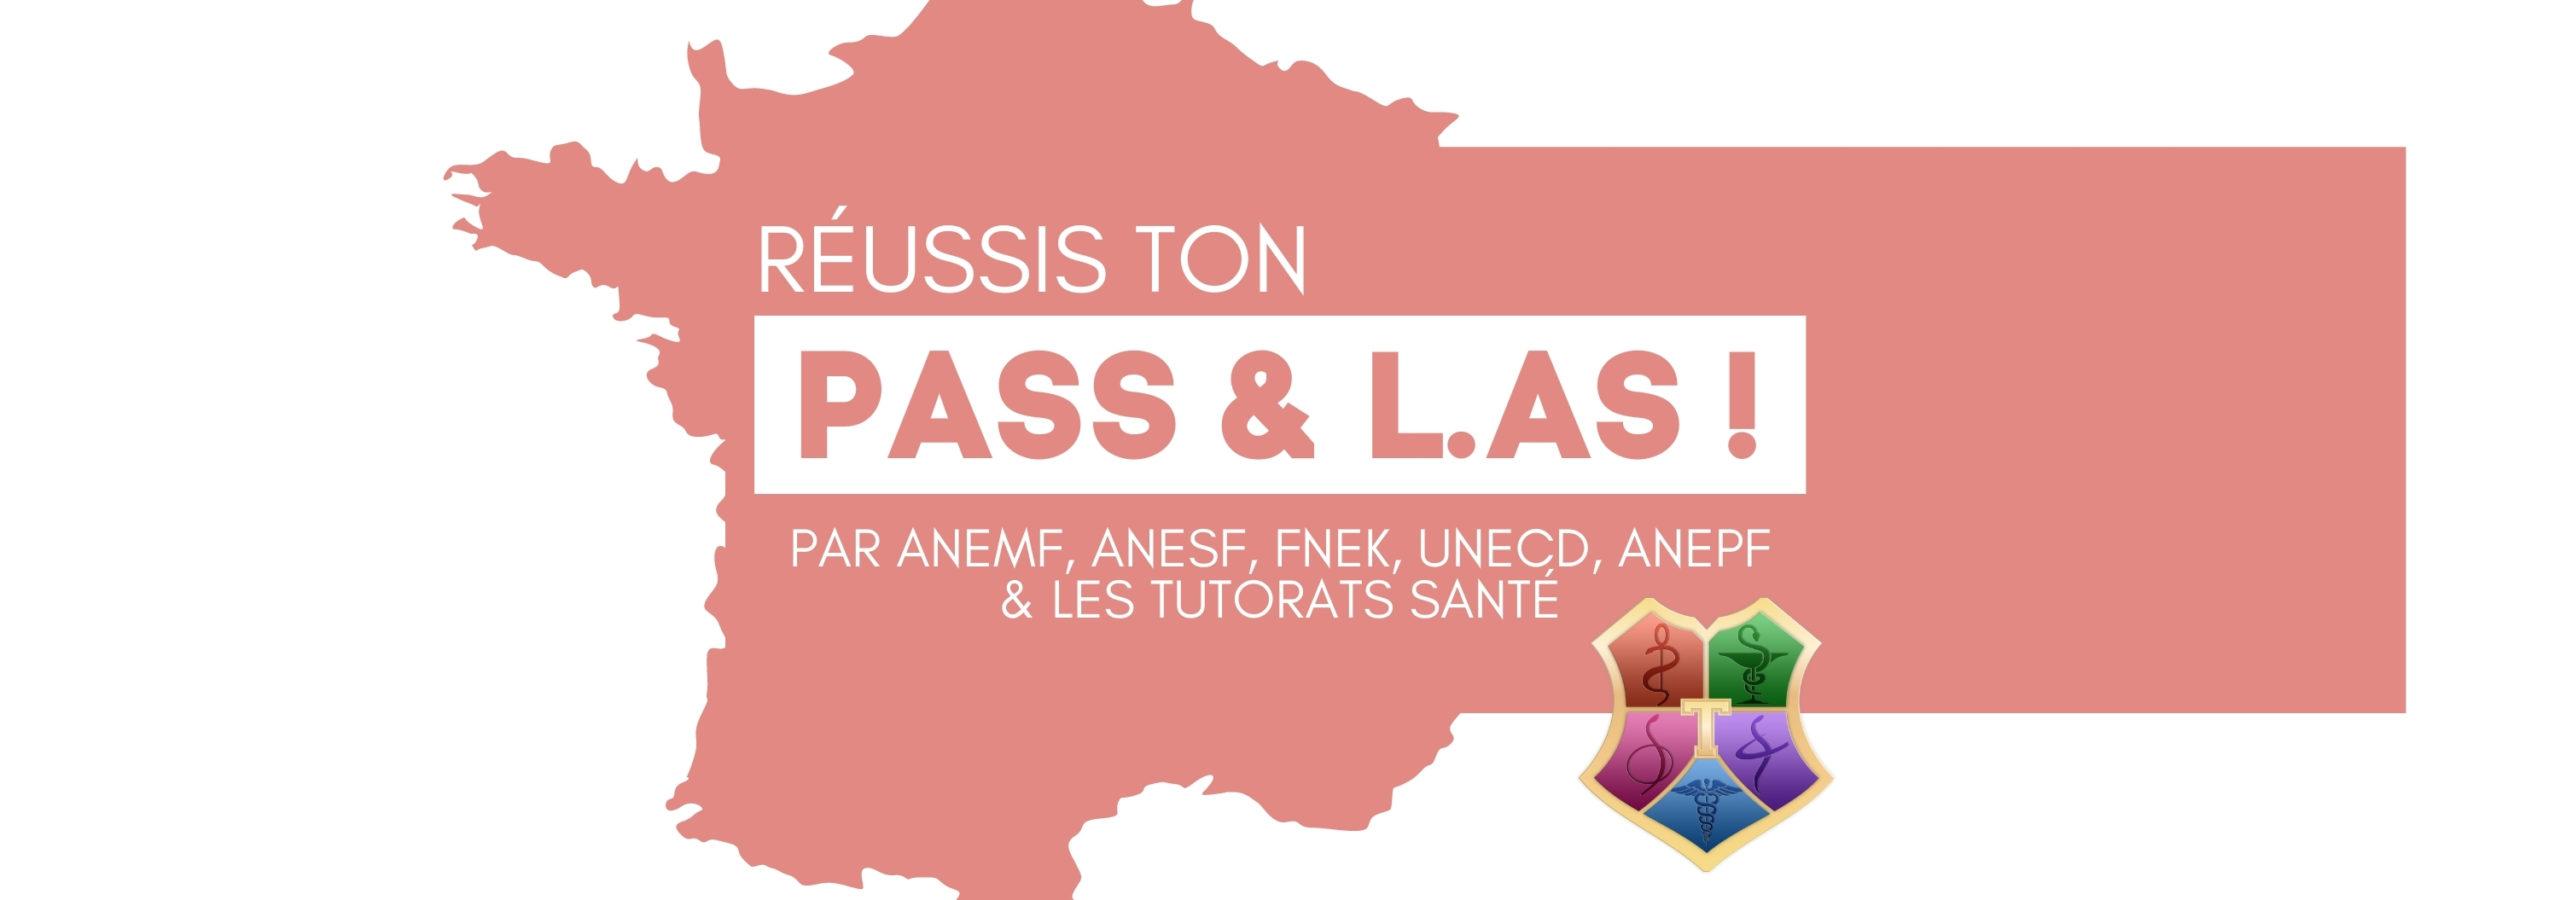 PASS & LAS